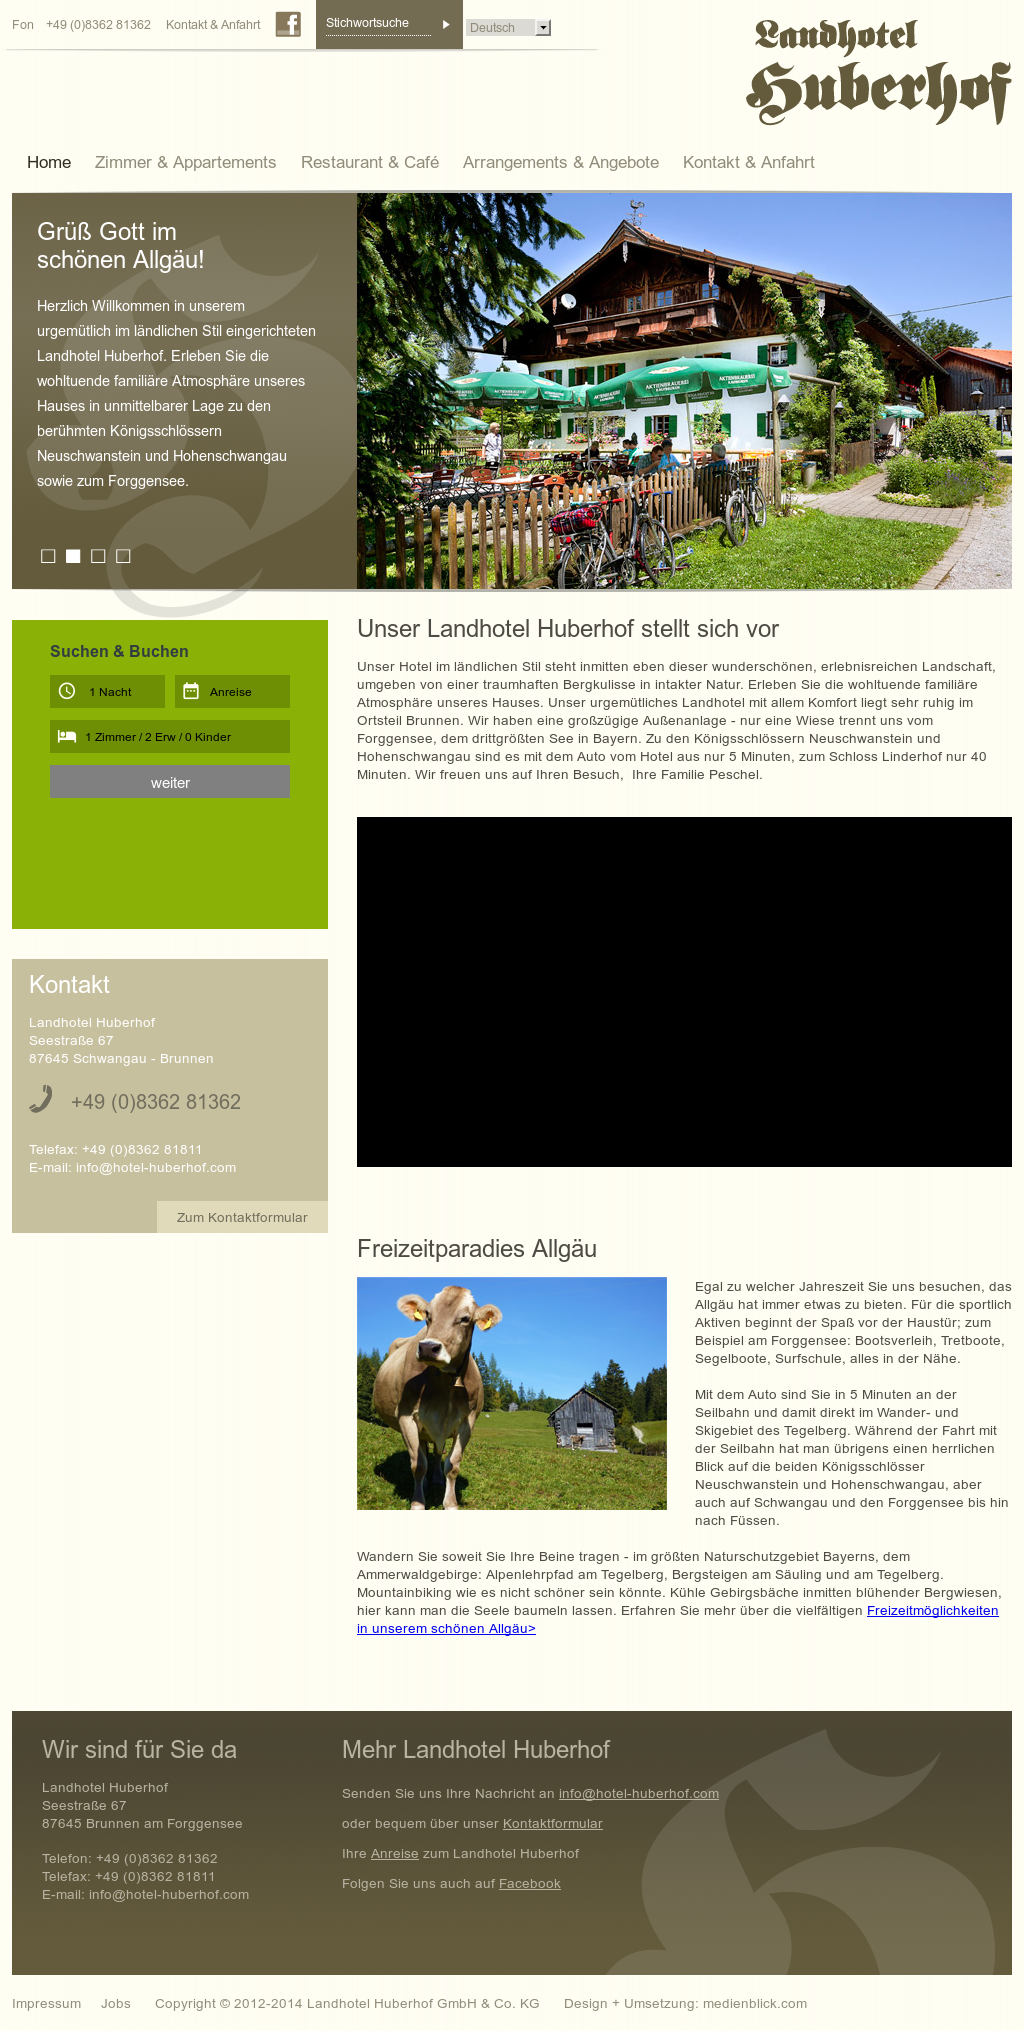 Landhotel Huberhof Competitors, Revenue and Employees - Owler ...